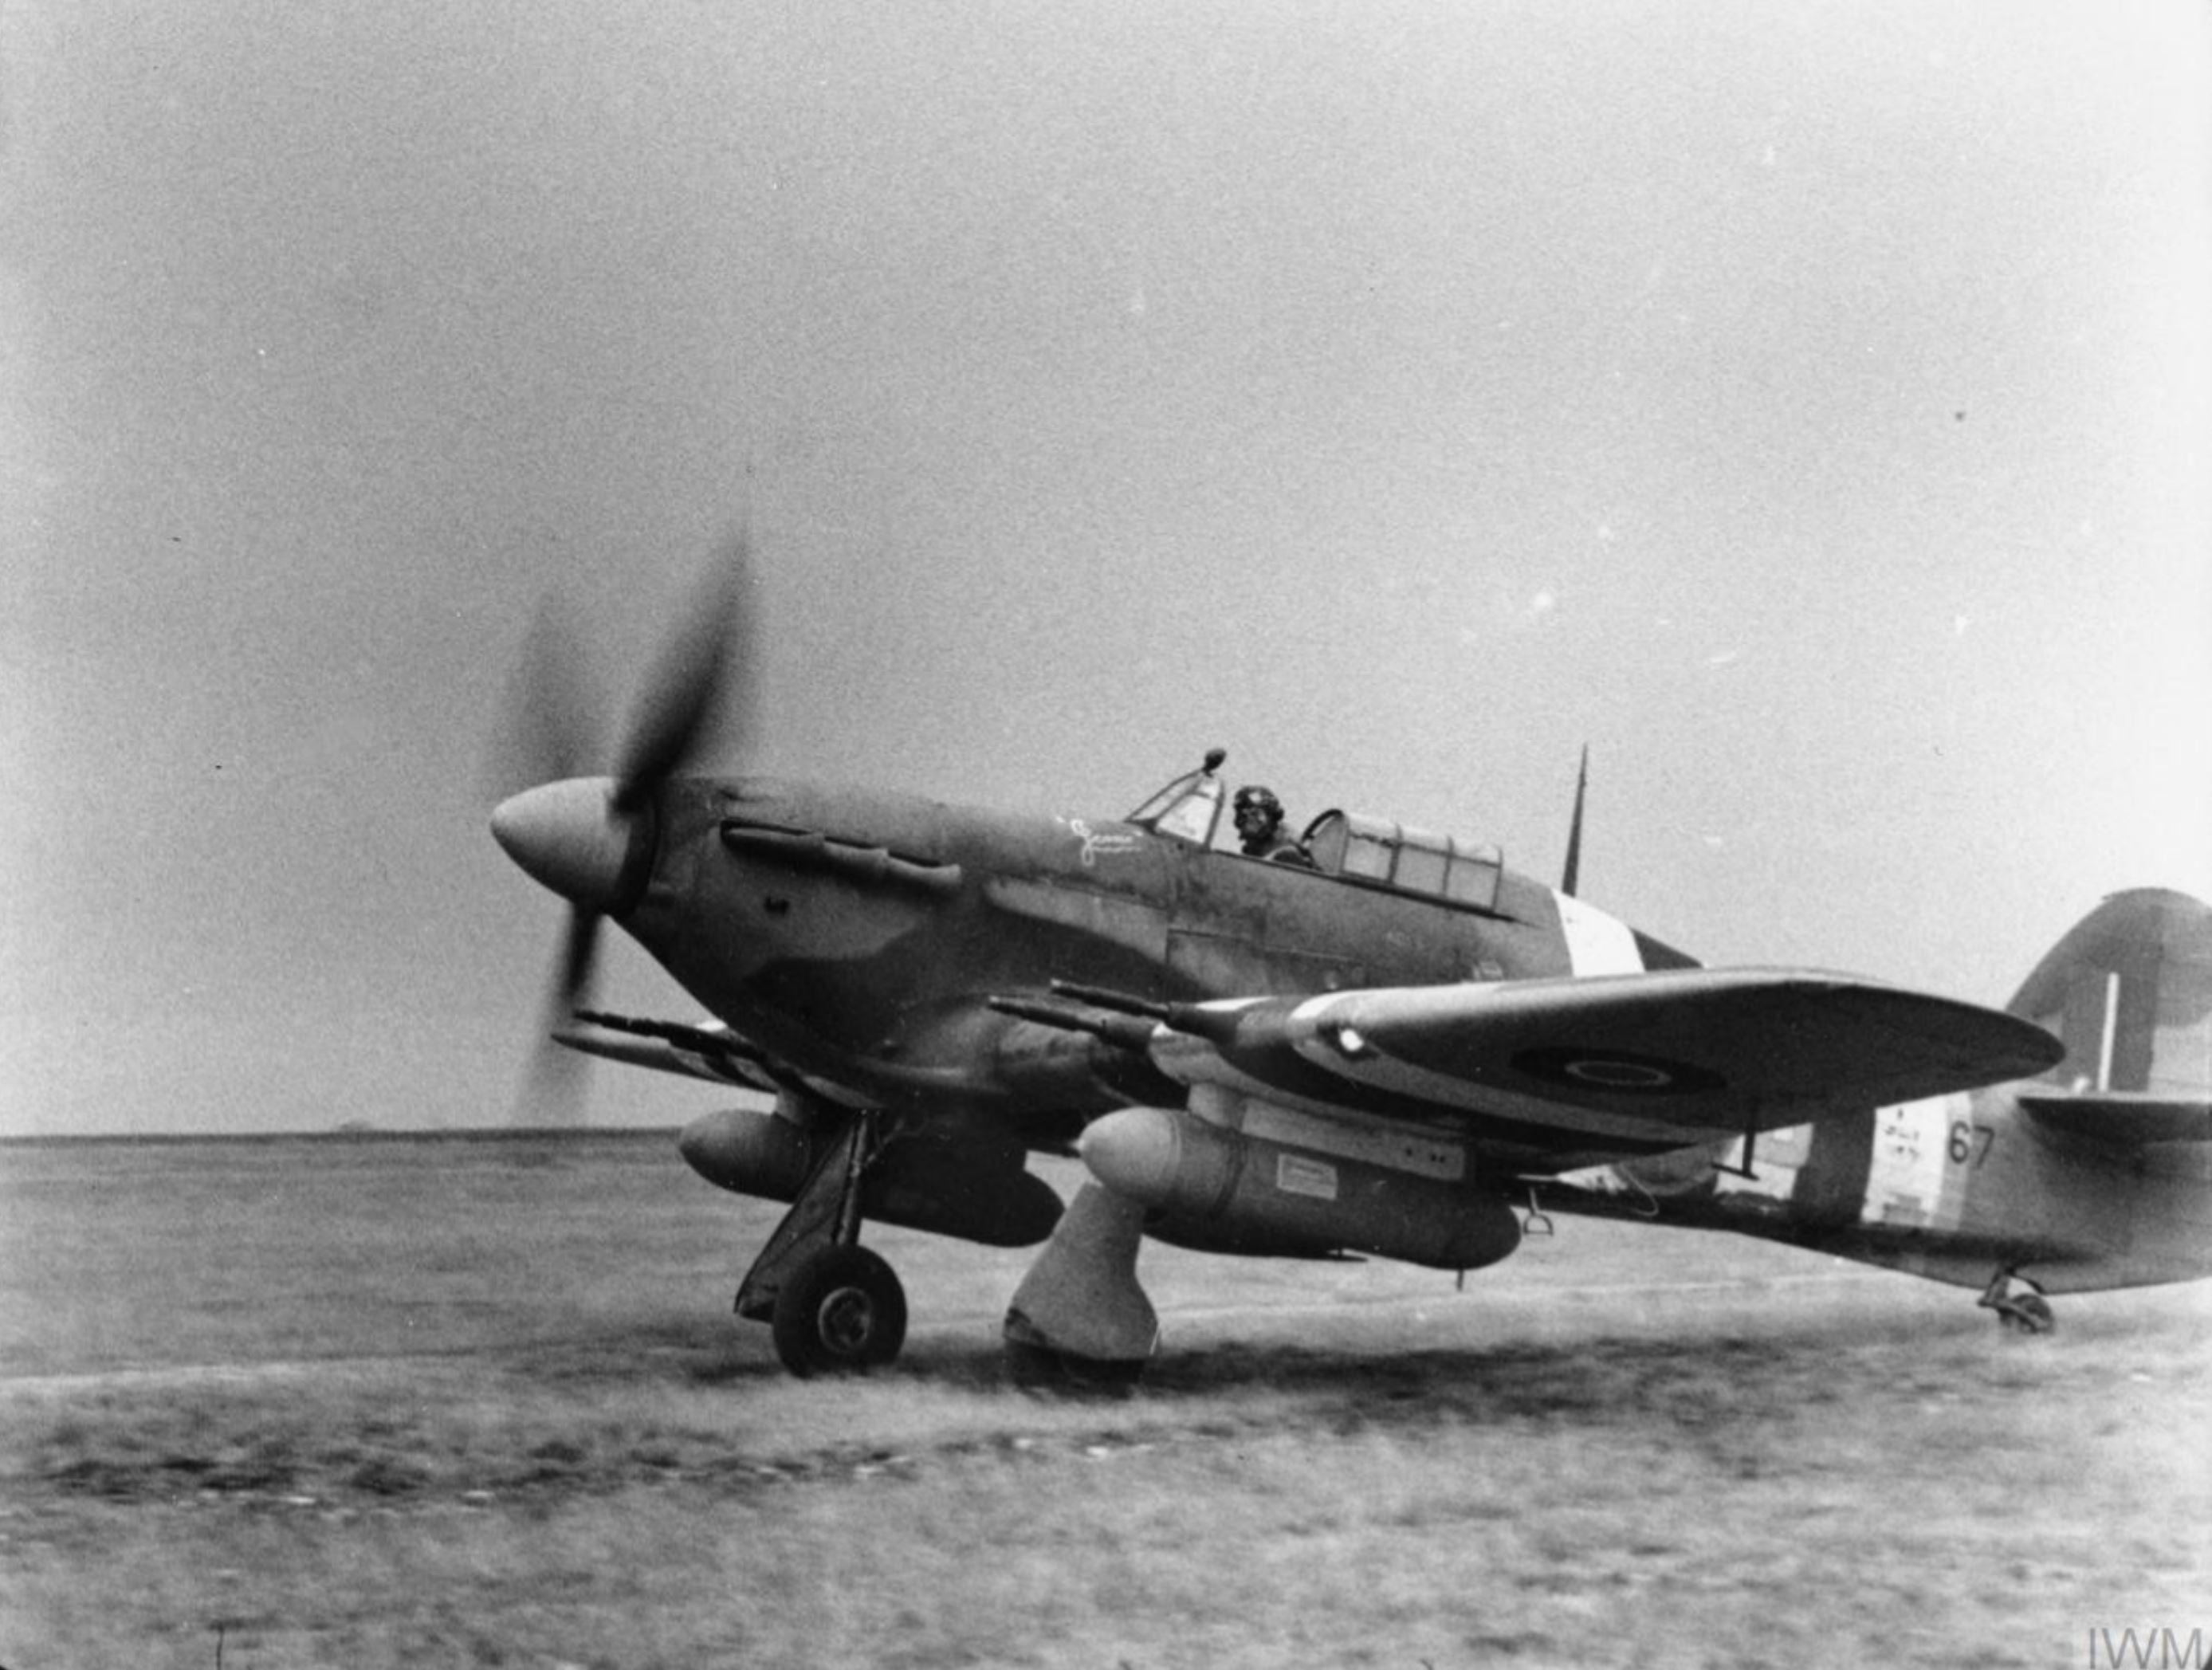 Hurricane IIc RAF 1697ADLS DRB MW367 landing at Hampshire Jun 1944 IWM FLM2582